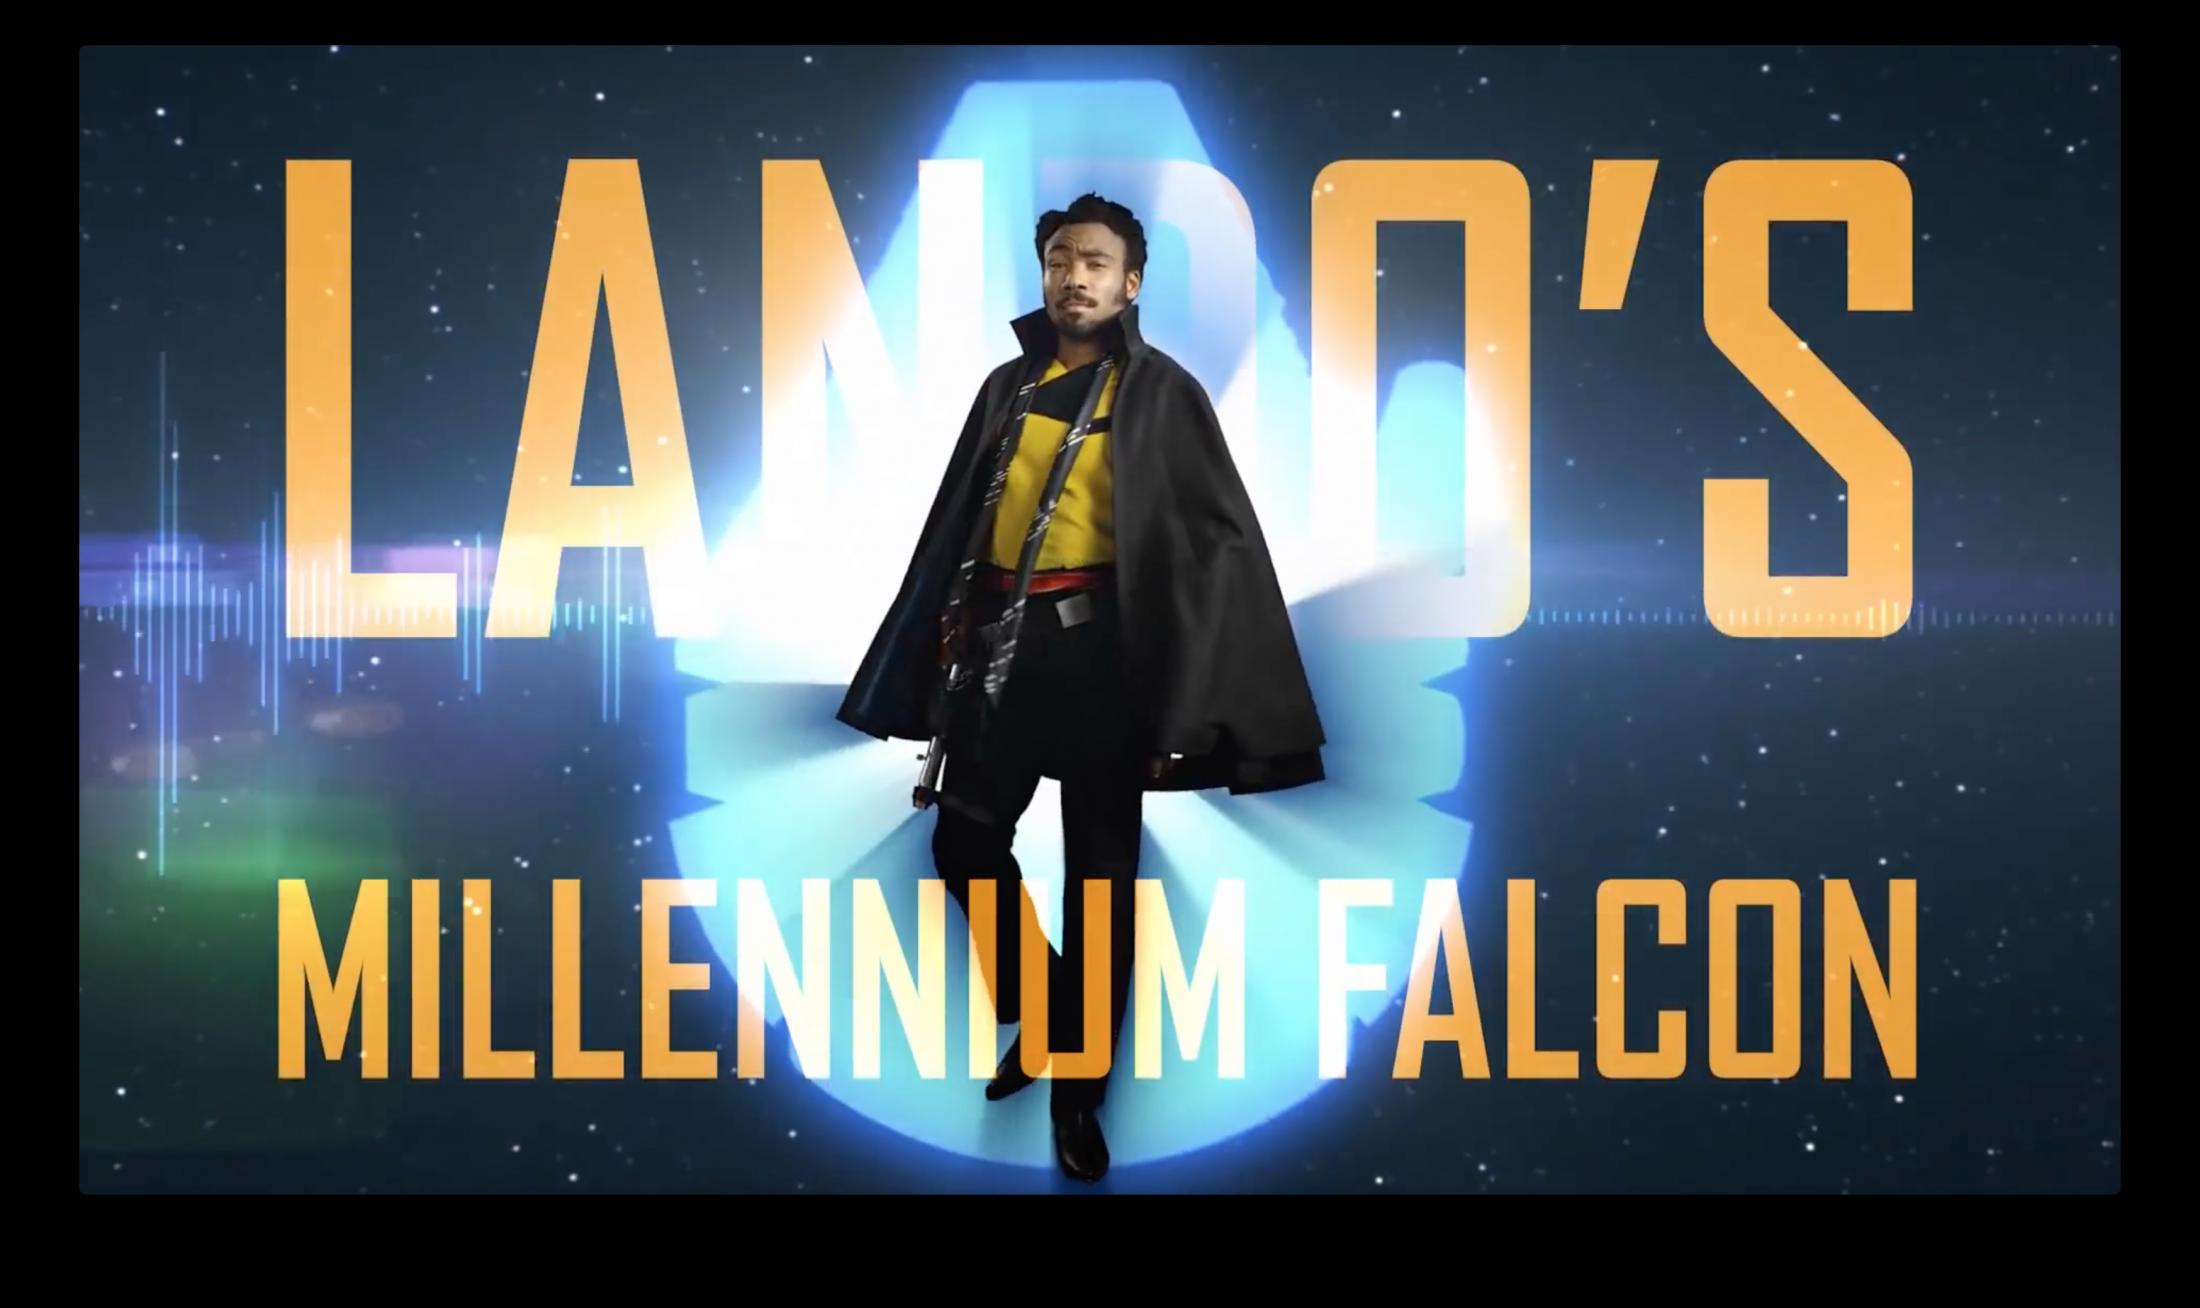 Thumbnail for Lando's Millennium Falcon